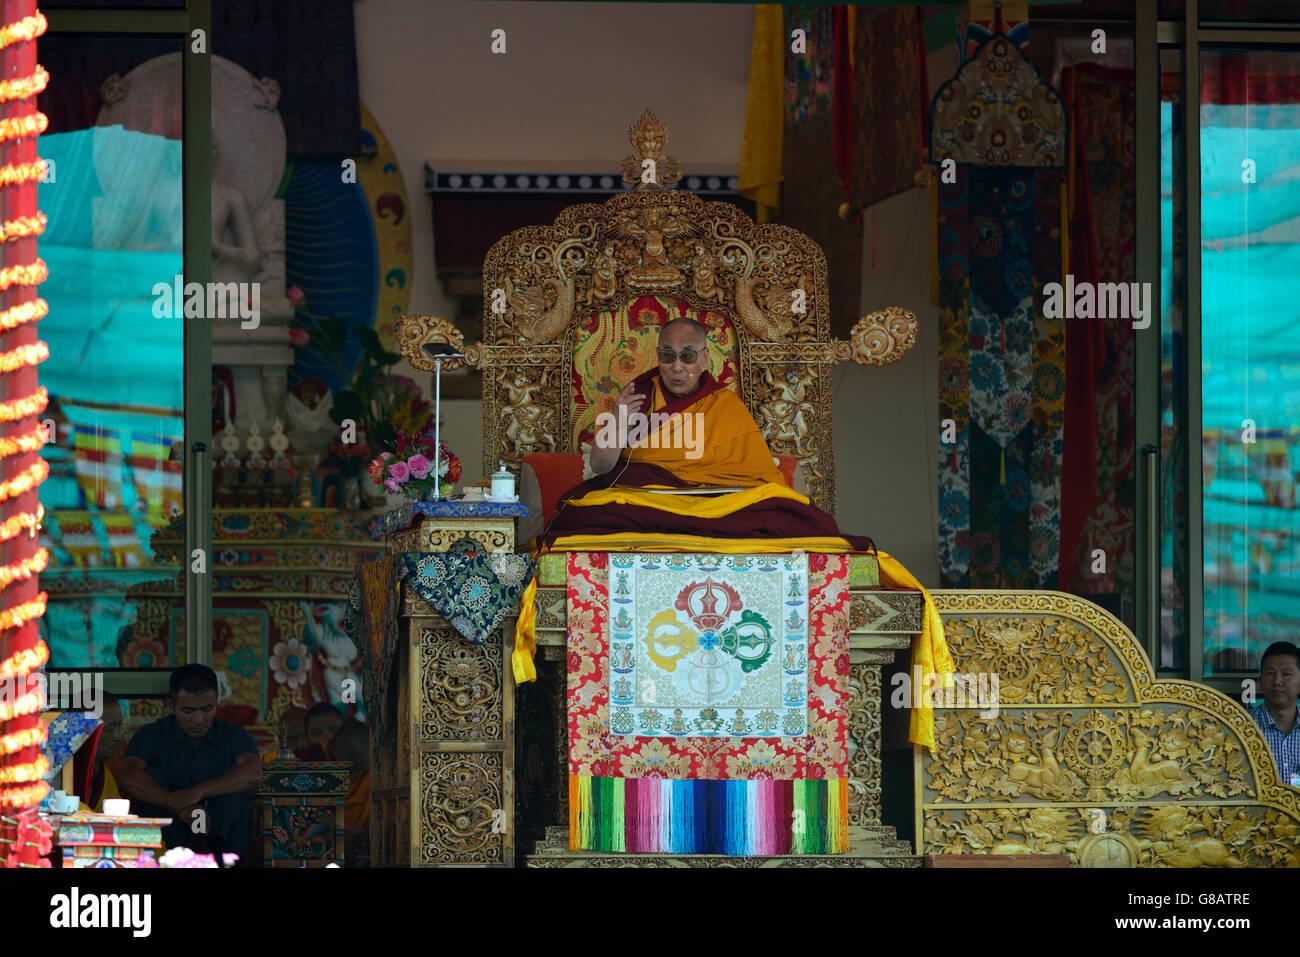 Dalai Lama during the Kalachakra-Initiations, Choklamsar, Ladakh, Jammu and Kaschmir, India - Stock Image